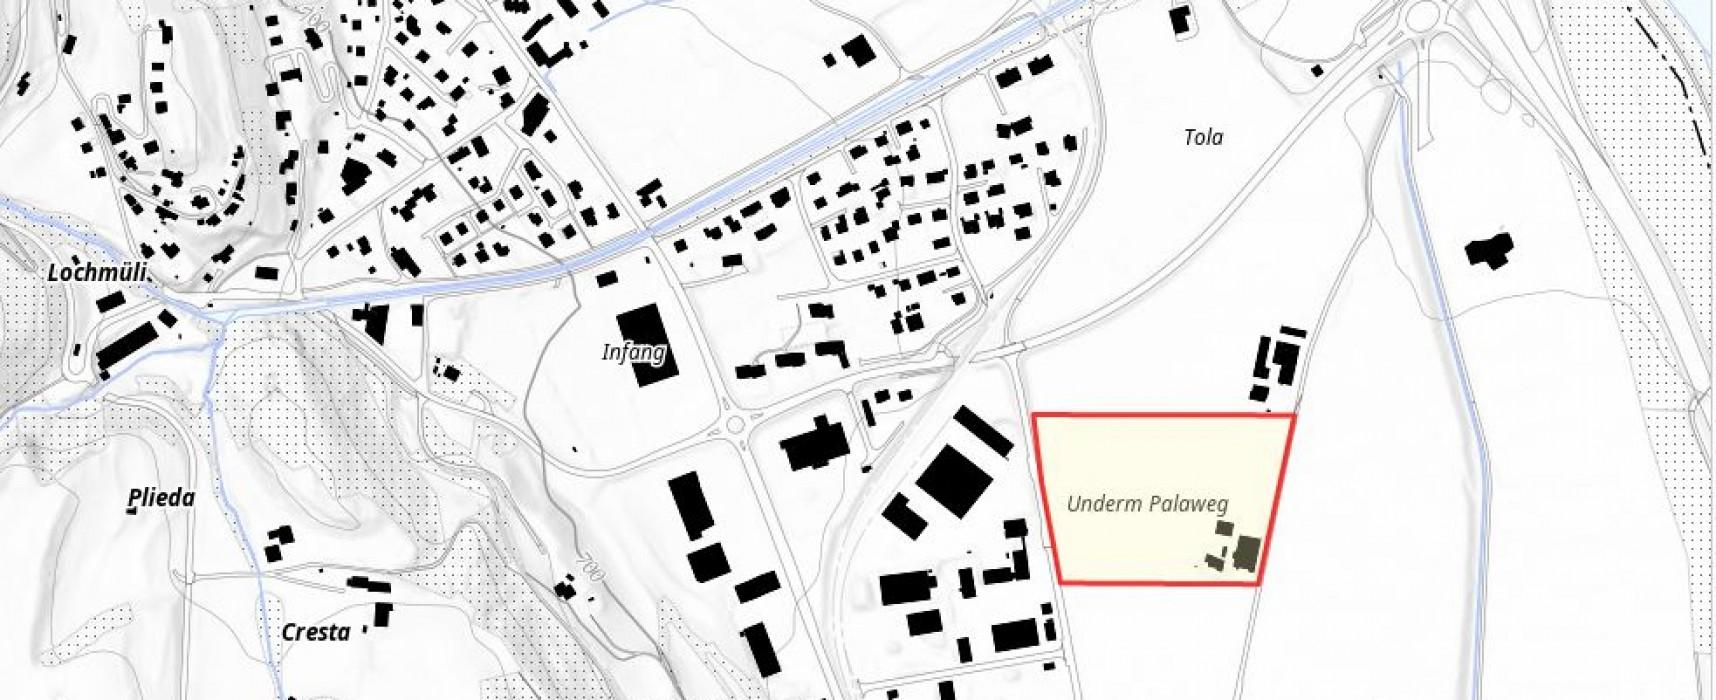 Thusis: Gärfuttersilo soll gebaut werden